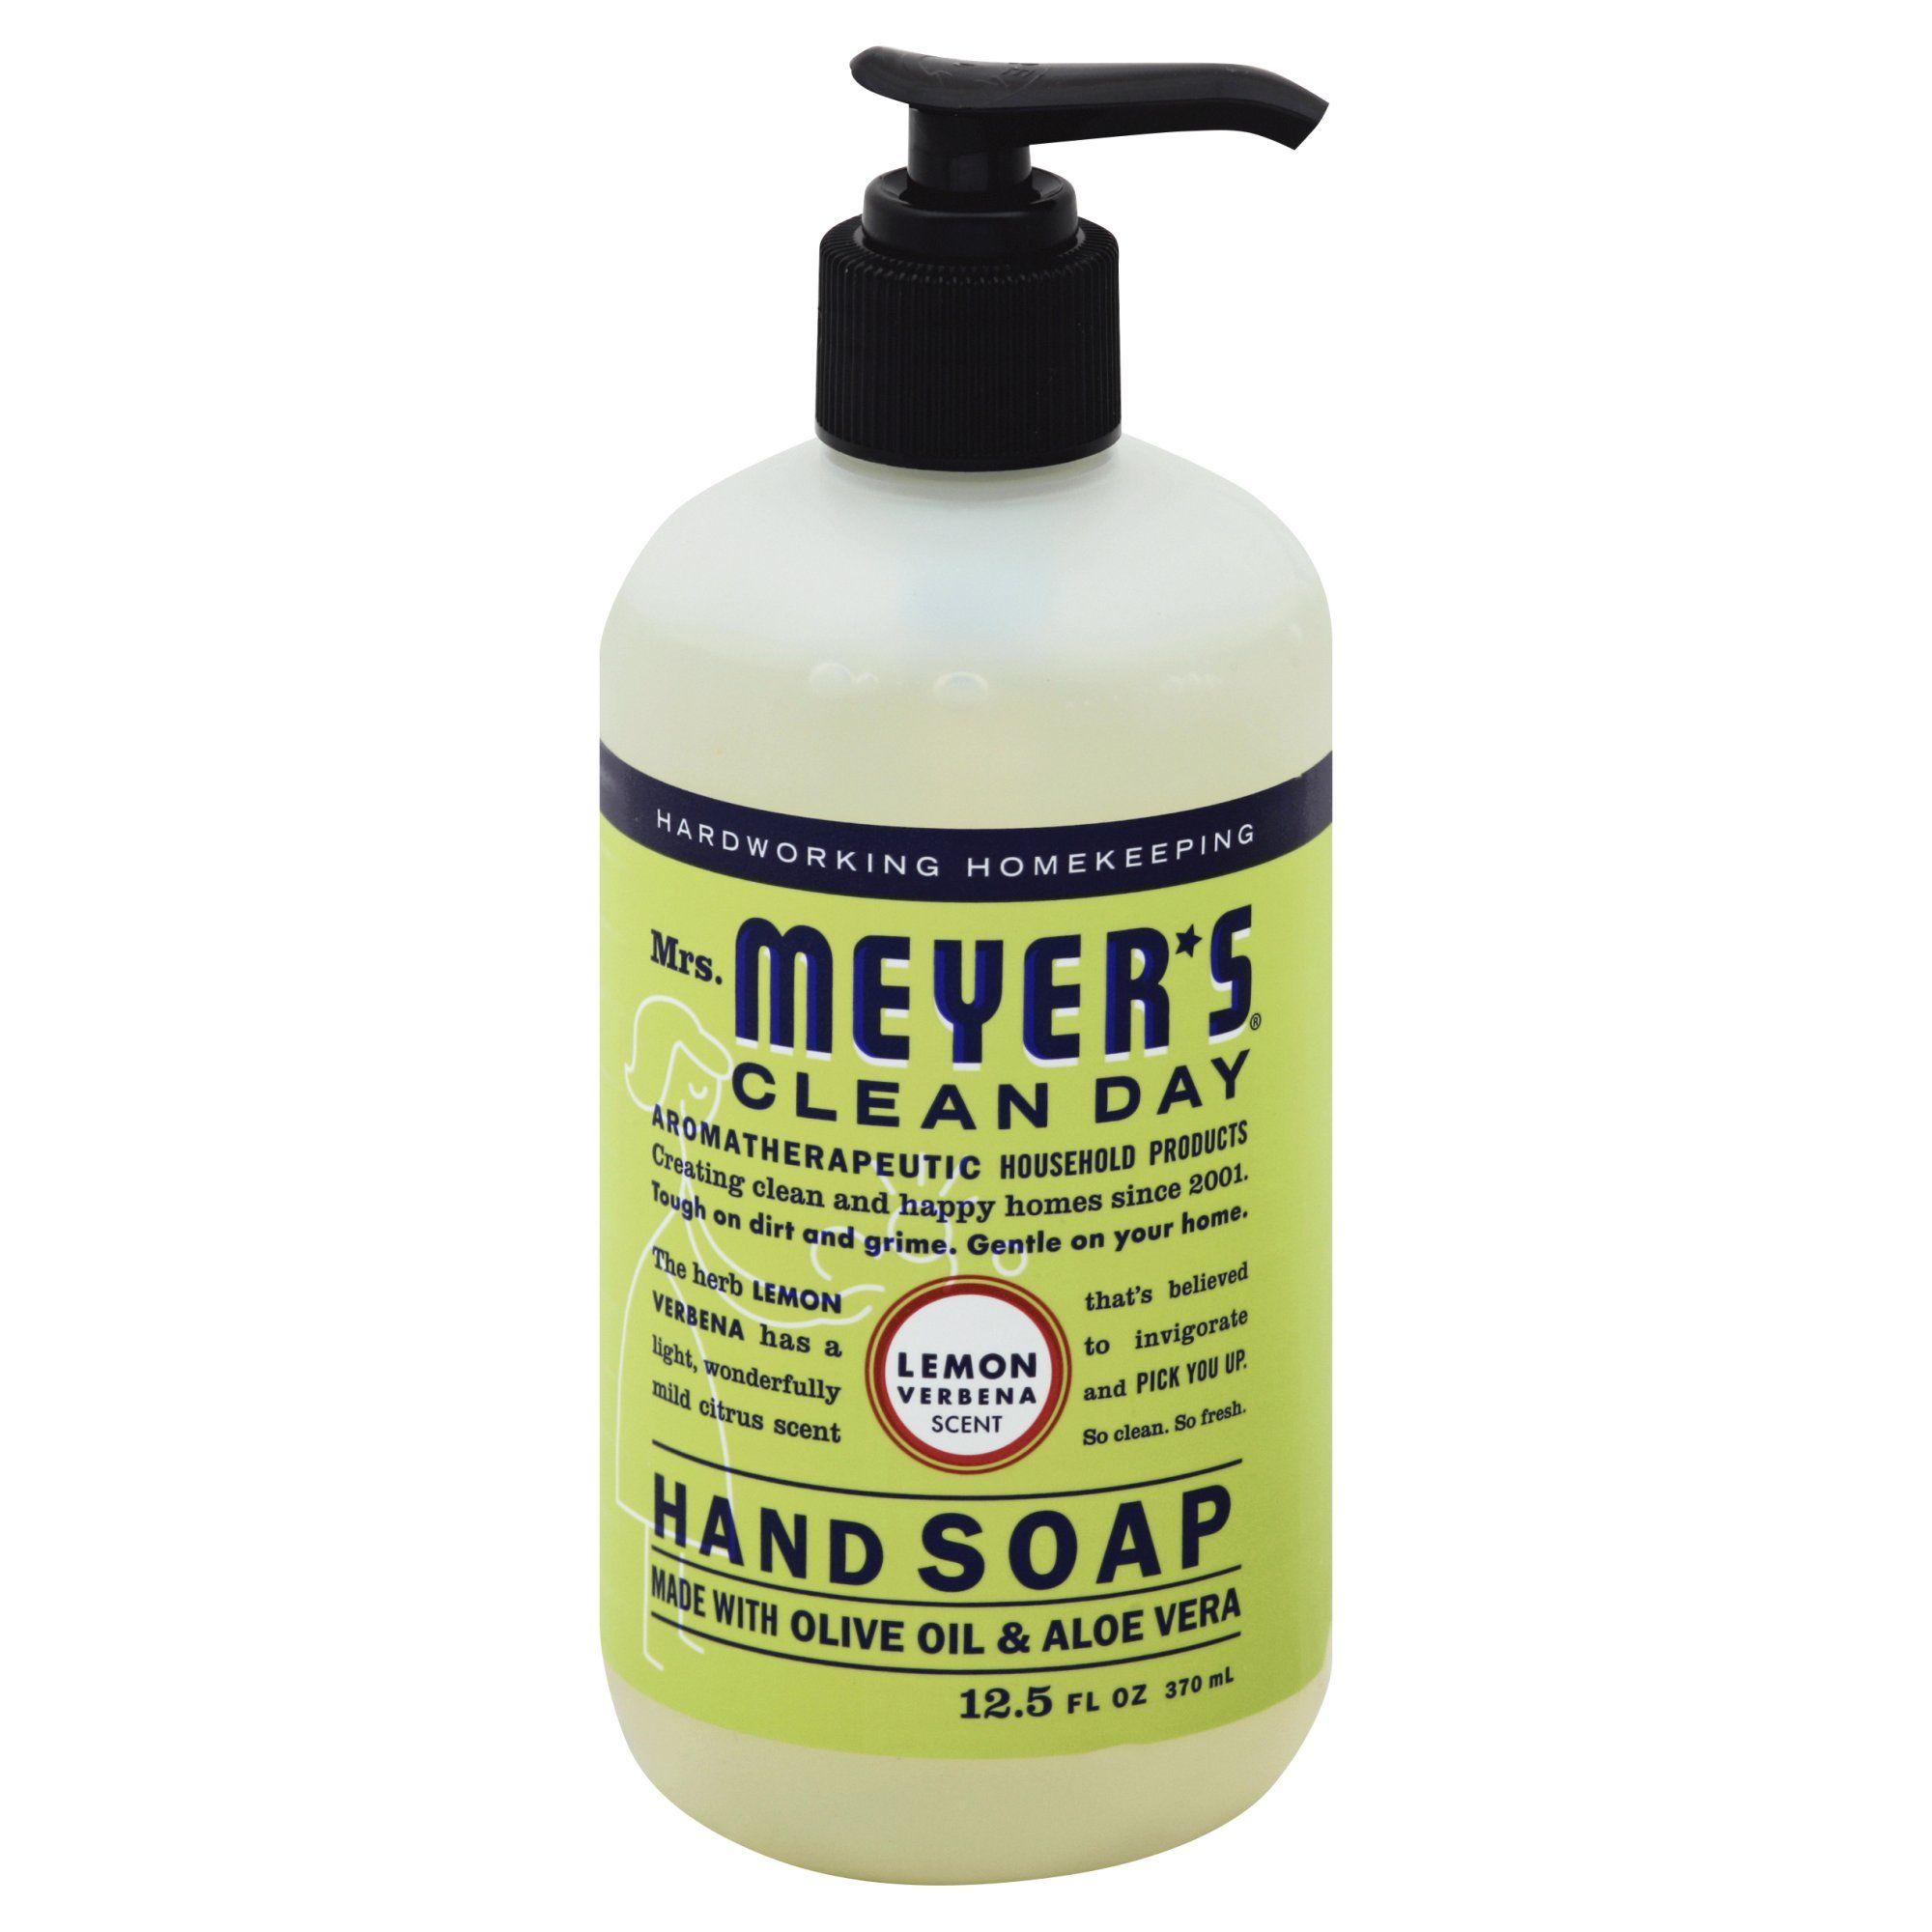 Mrs Meyer S Hand Soap Lemon 12 5 Oz Soap Sponsored Spon Oz Meyer Ad Lemon Hand Soap Liquid Hand Soap Paraben Free Products